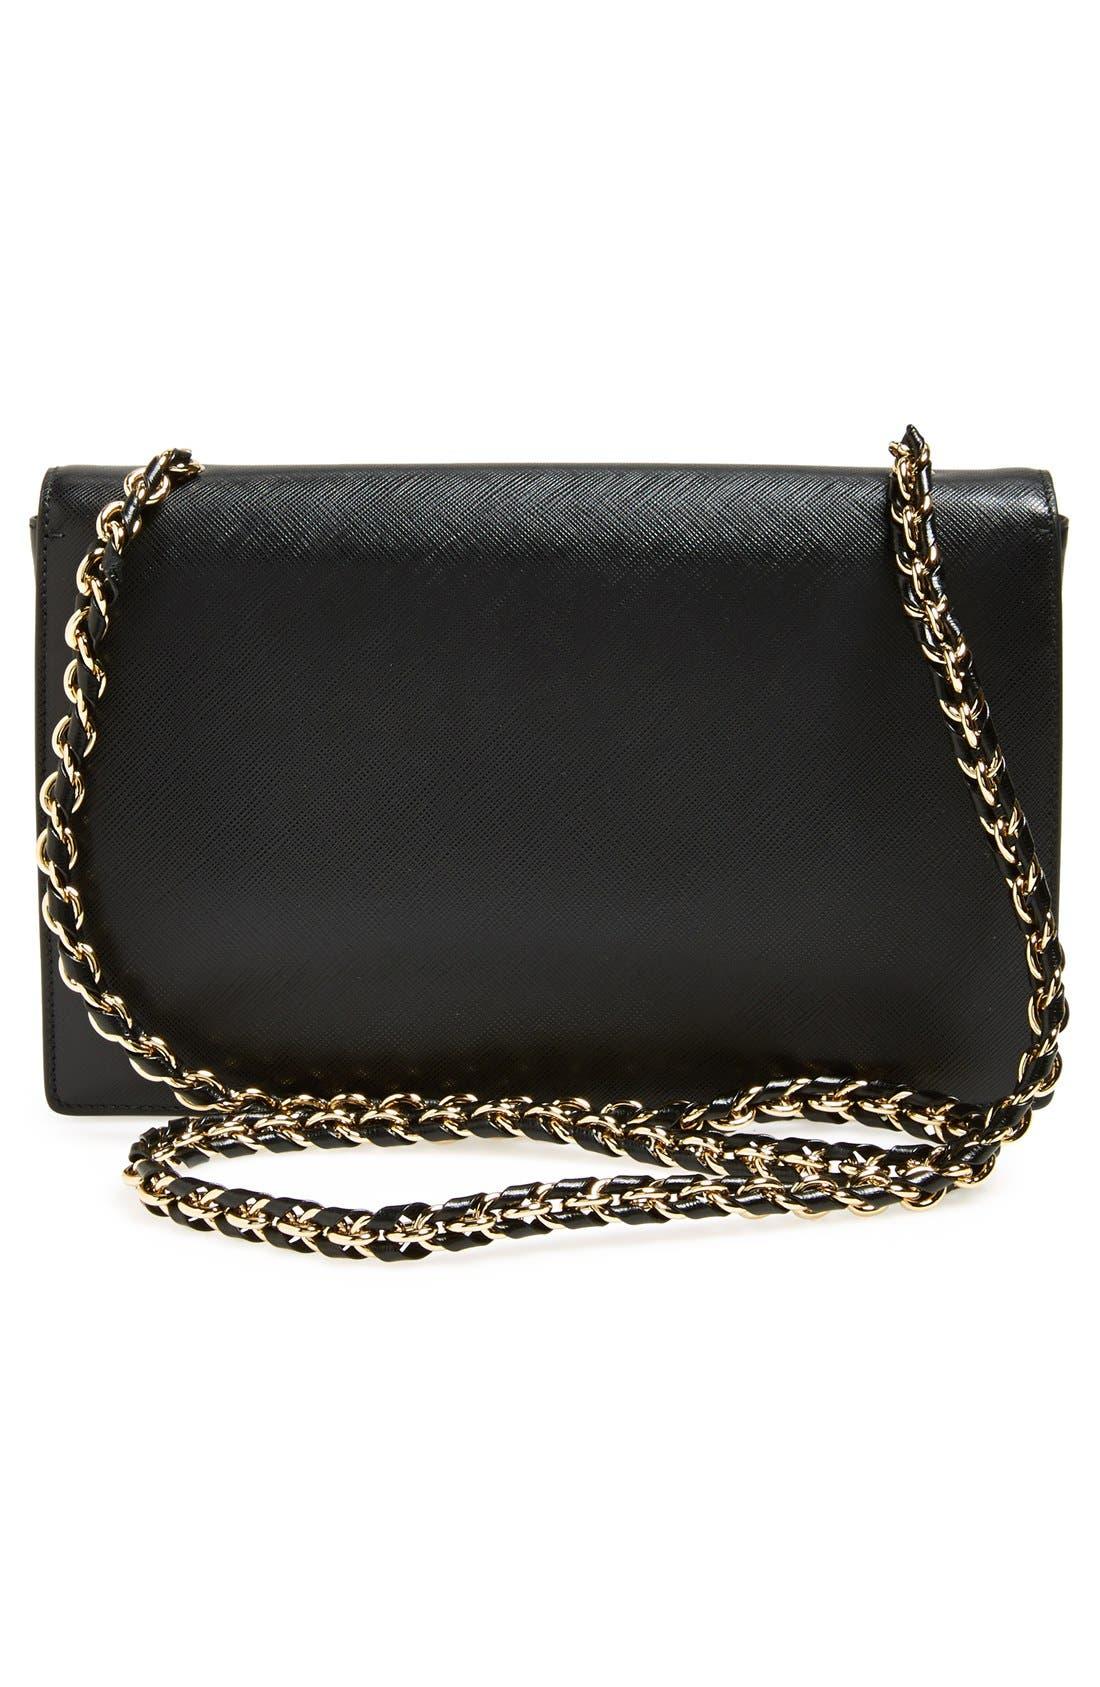 Saffiano Leather Shoulder Bag,                             Alternate thumbnail 14, color,